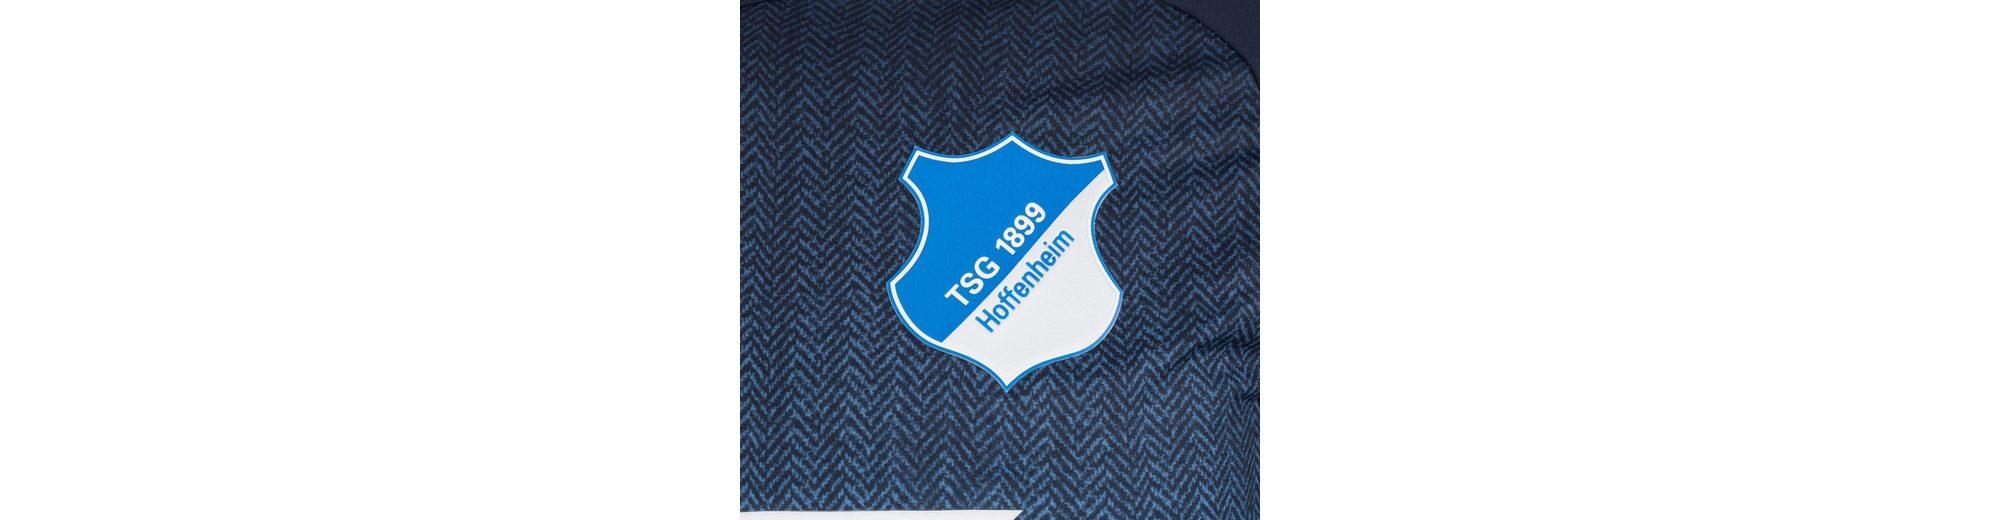 Lotto Fußballtrikot 1899 Hoffenheim 17/18 Heim Erkunden Manchester Große Online-Verkauf Niedriger Versand Günstiger Preis Billig Rabatt Verkauf 4df1I5J58D